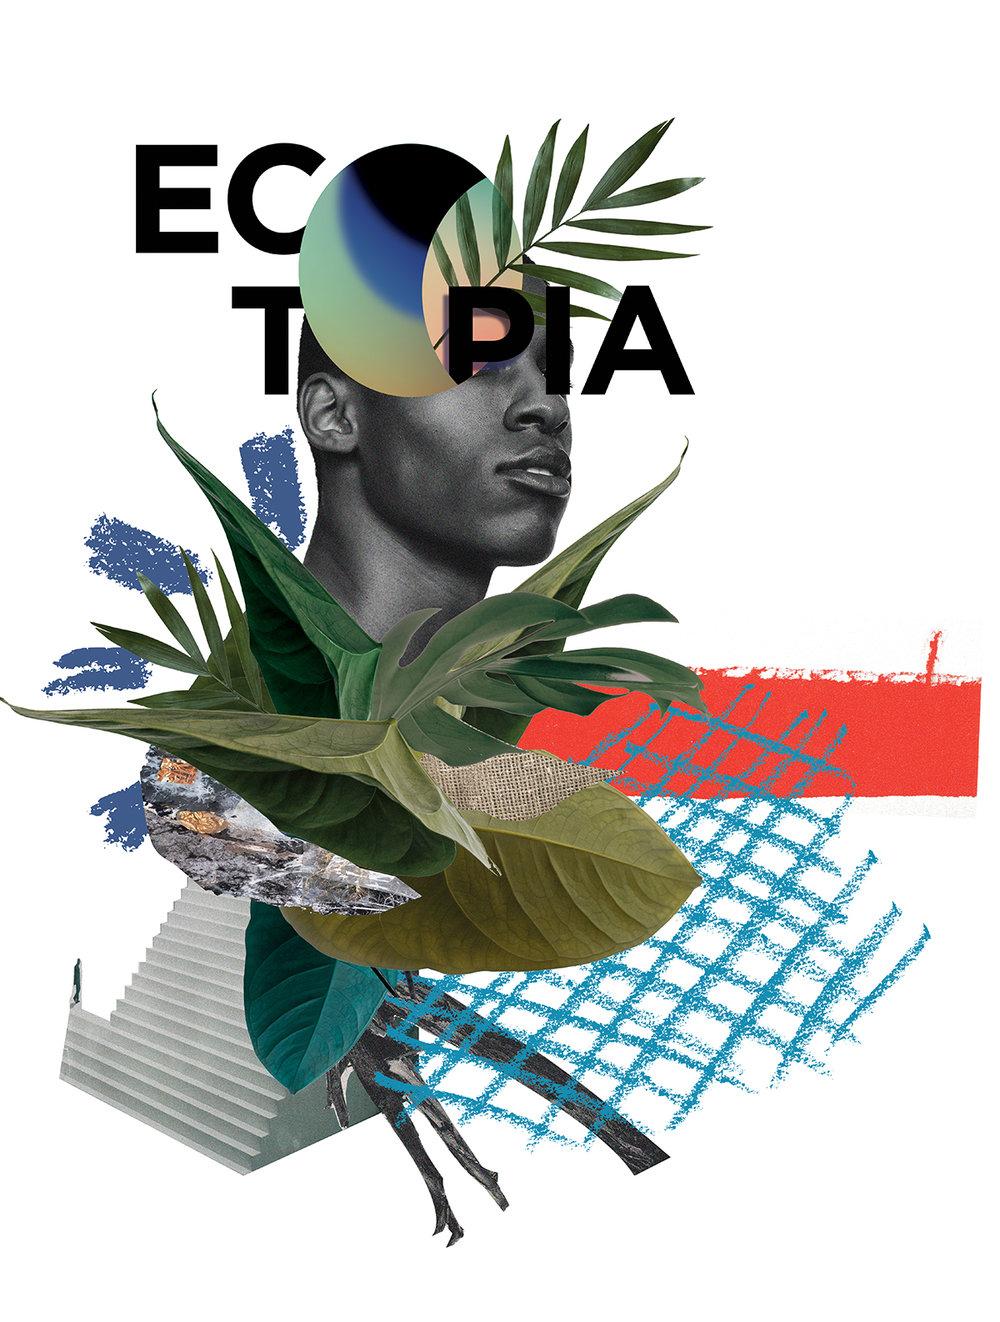 Ecotopia_2018_image2_LR_RGB.jpg